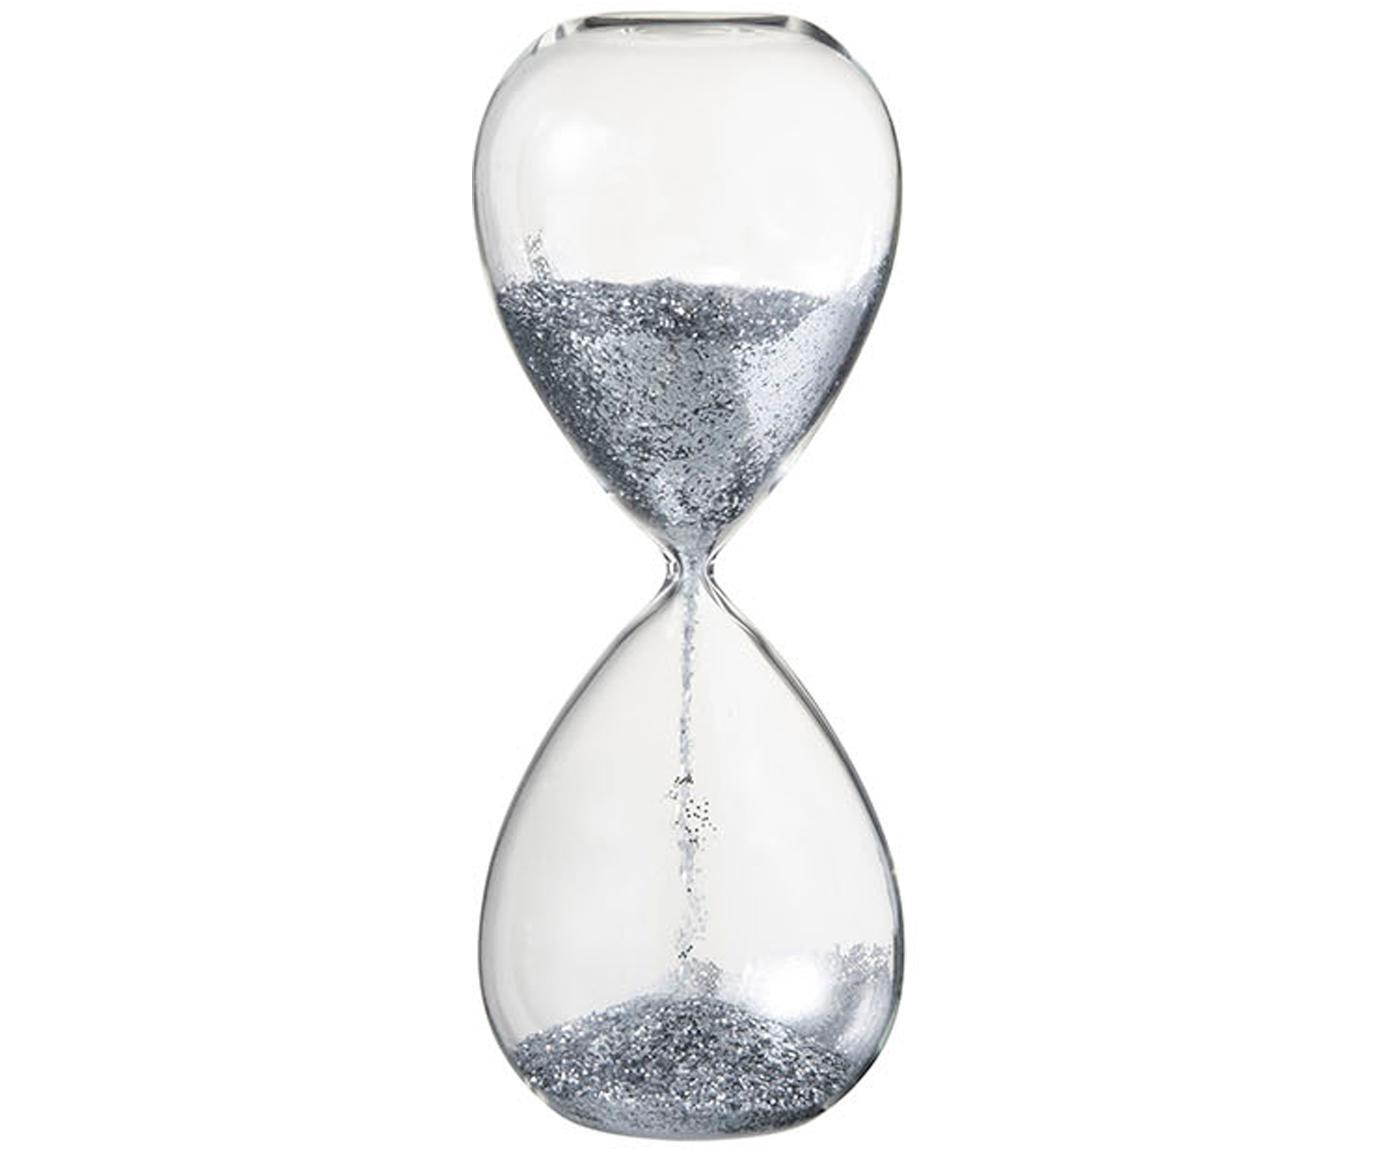 Zandloper Perleen, Transparant, zilverkleurig, Ø 7 x H 16 cm